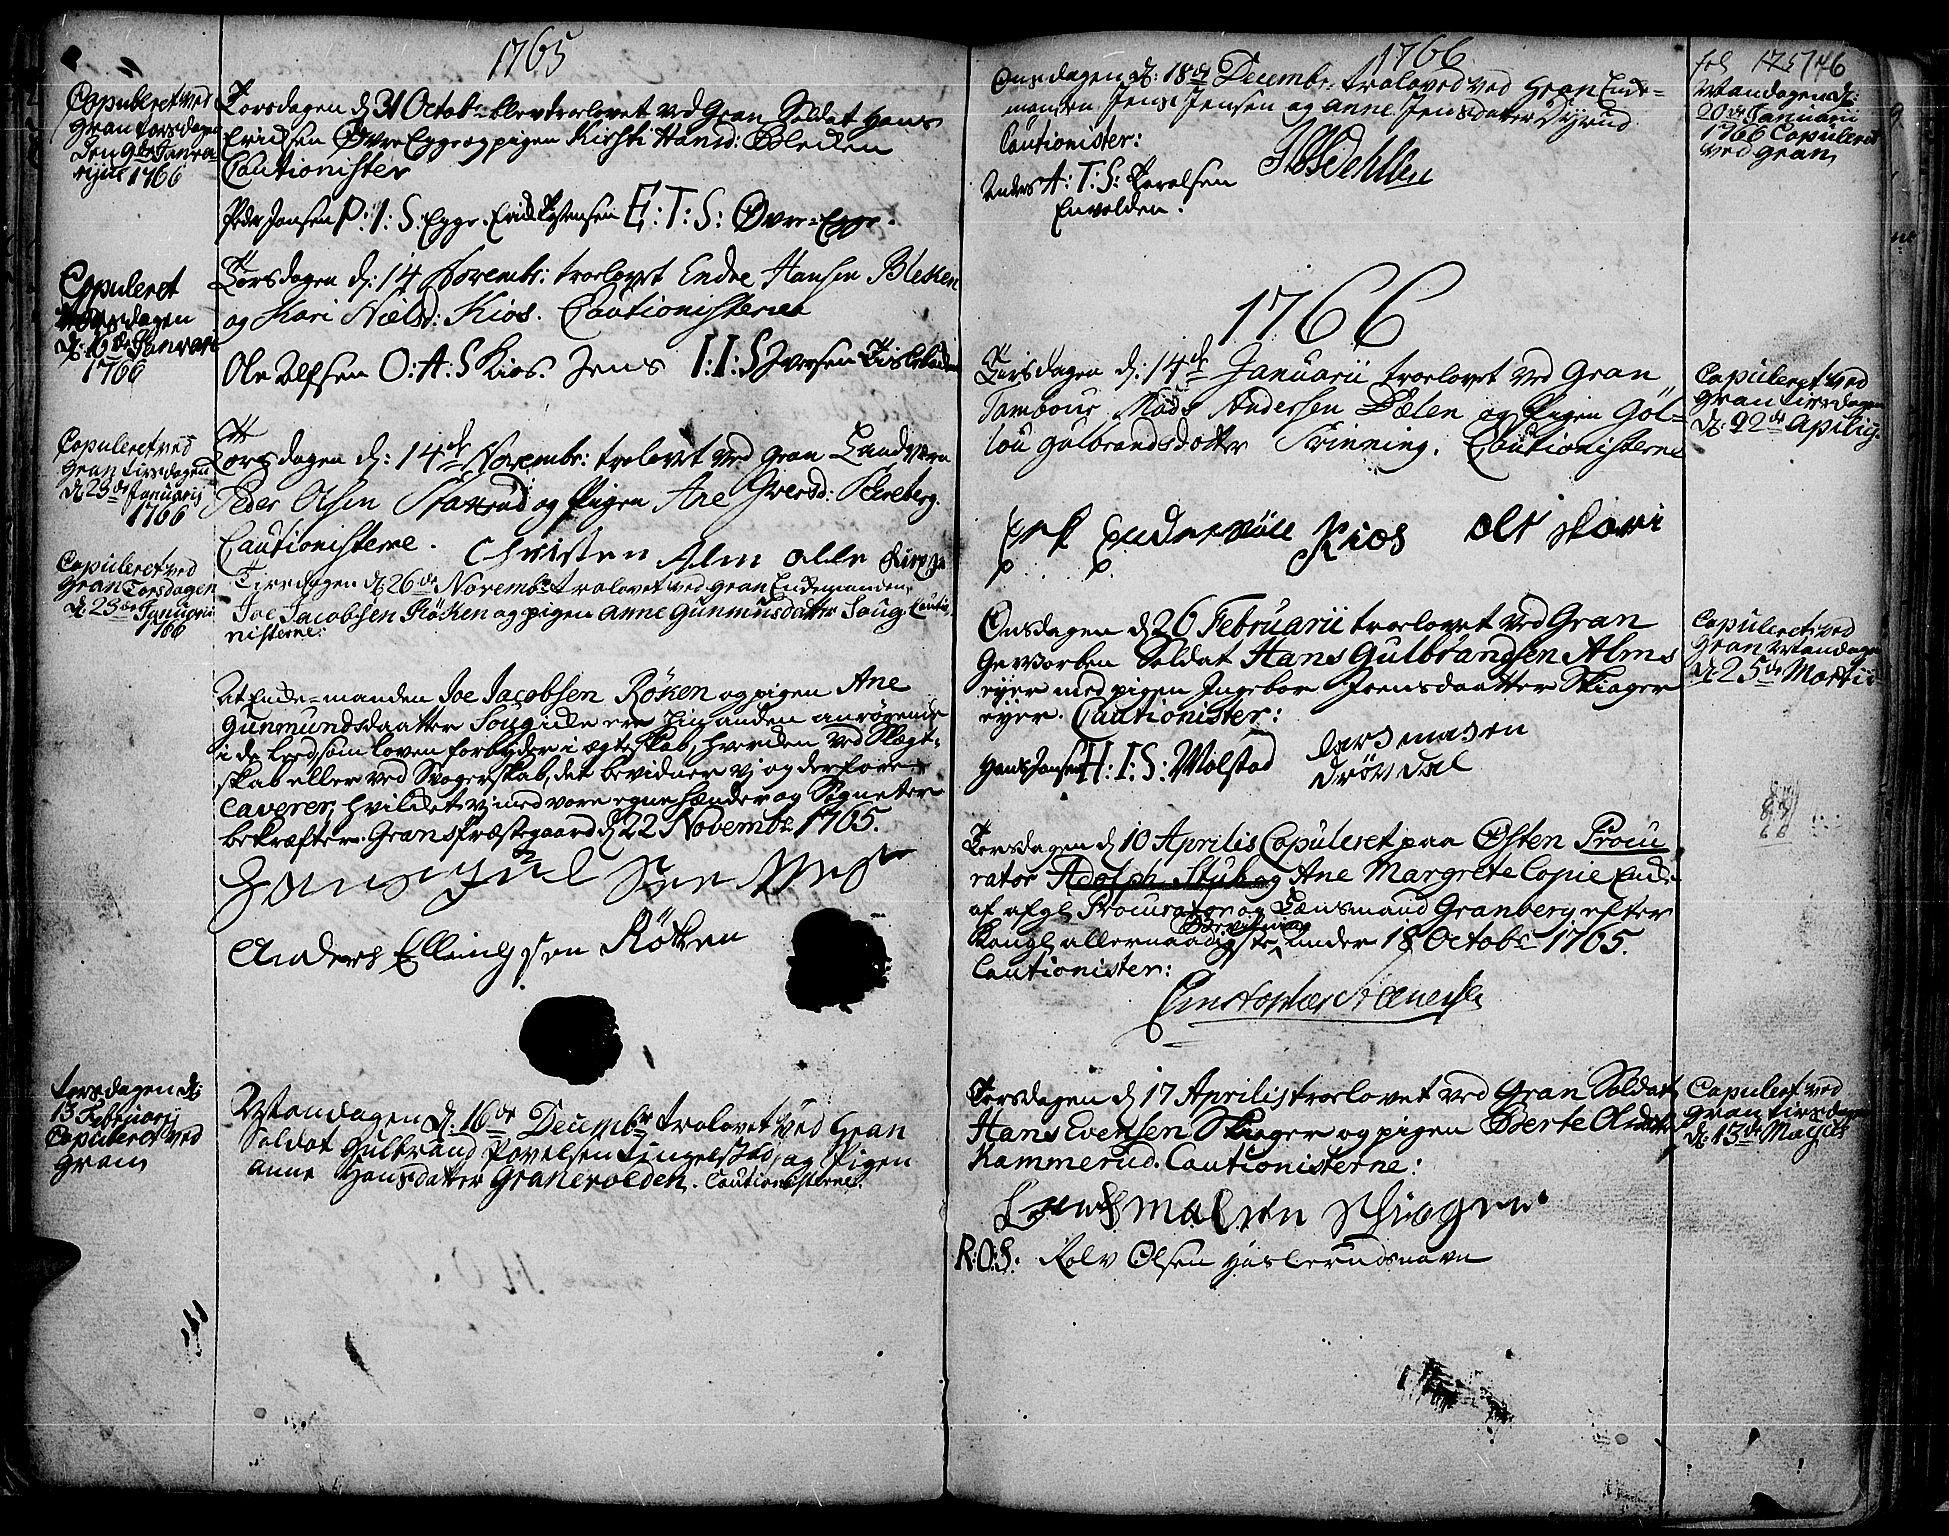 SAH, Gran prestekontor, Ministerialbok nr. 4, 1759-1775, s. 176